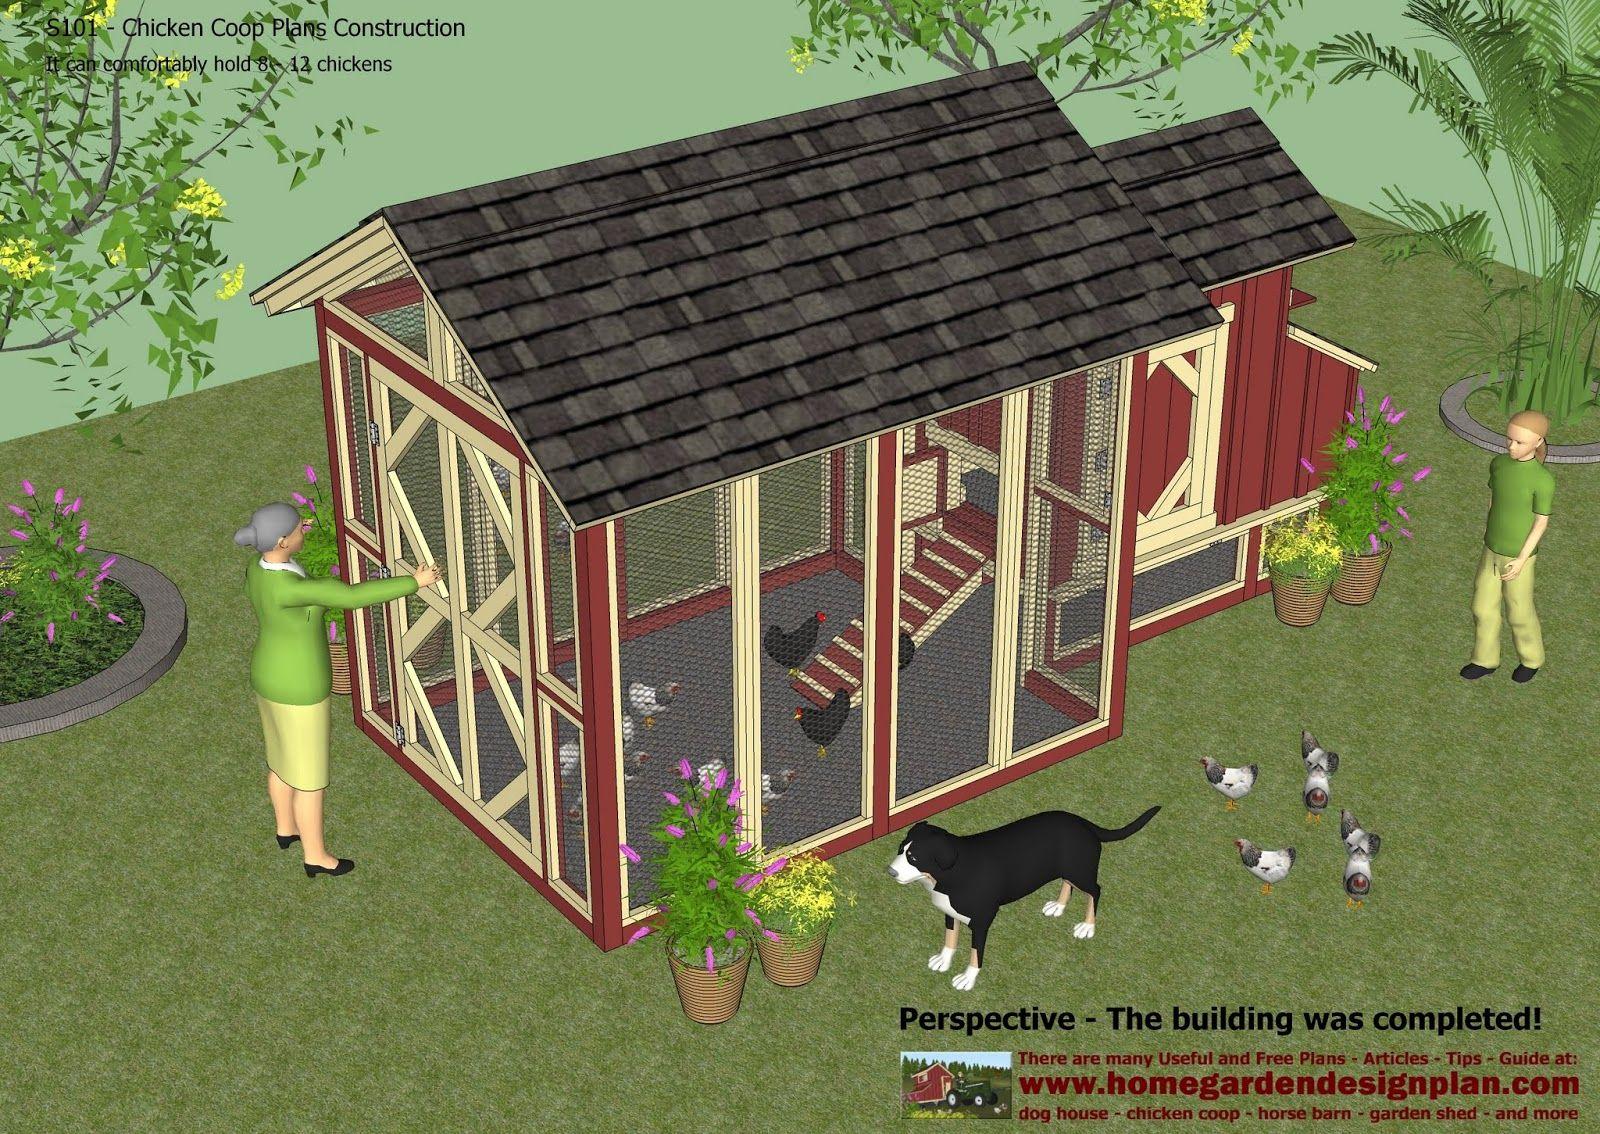 home garden plans s101 chicken coop plans construction chicken rh pinterest com